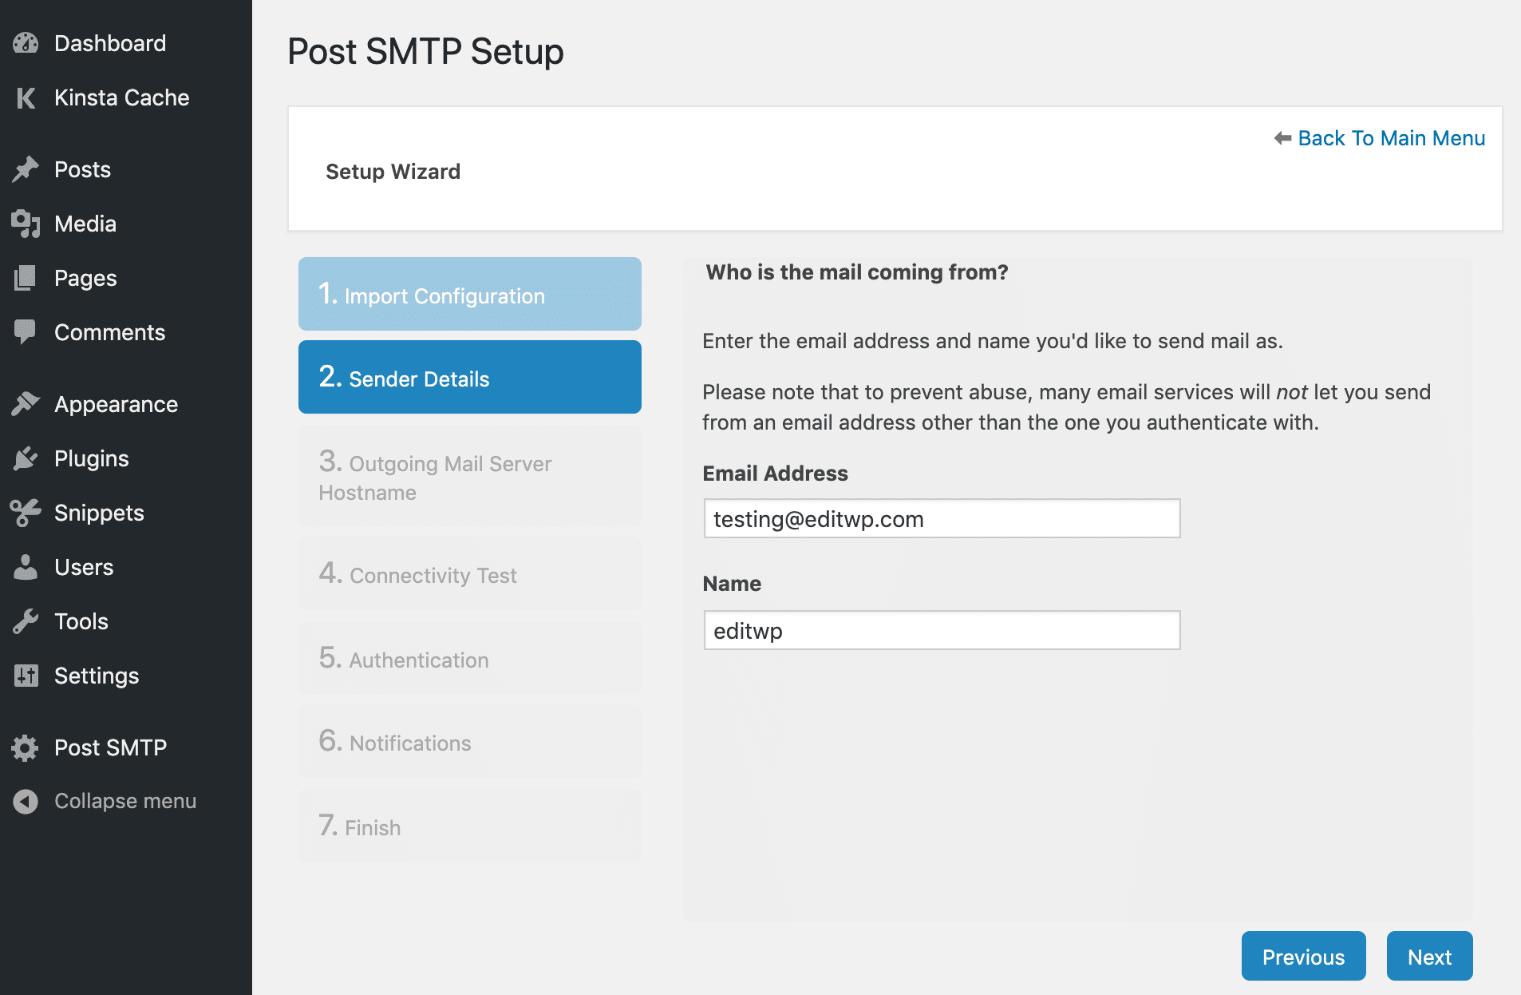 Post SMTP-Absenderdetails